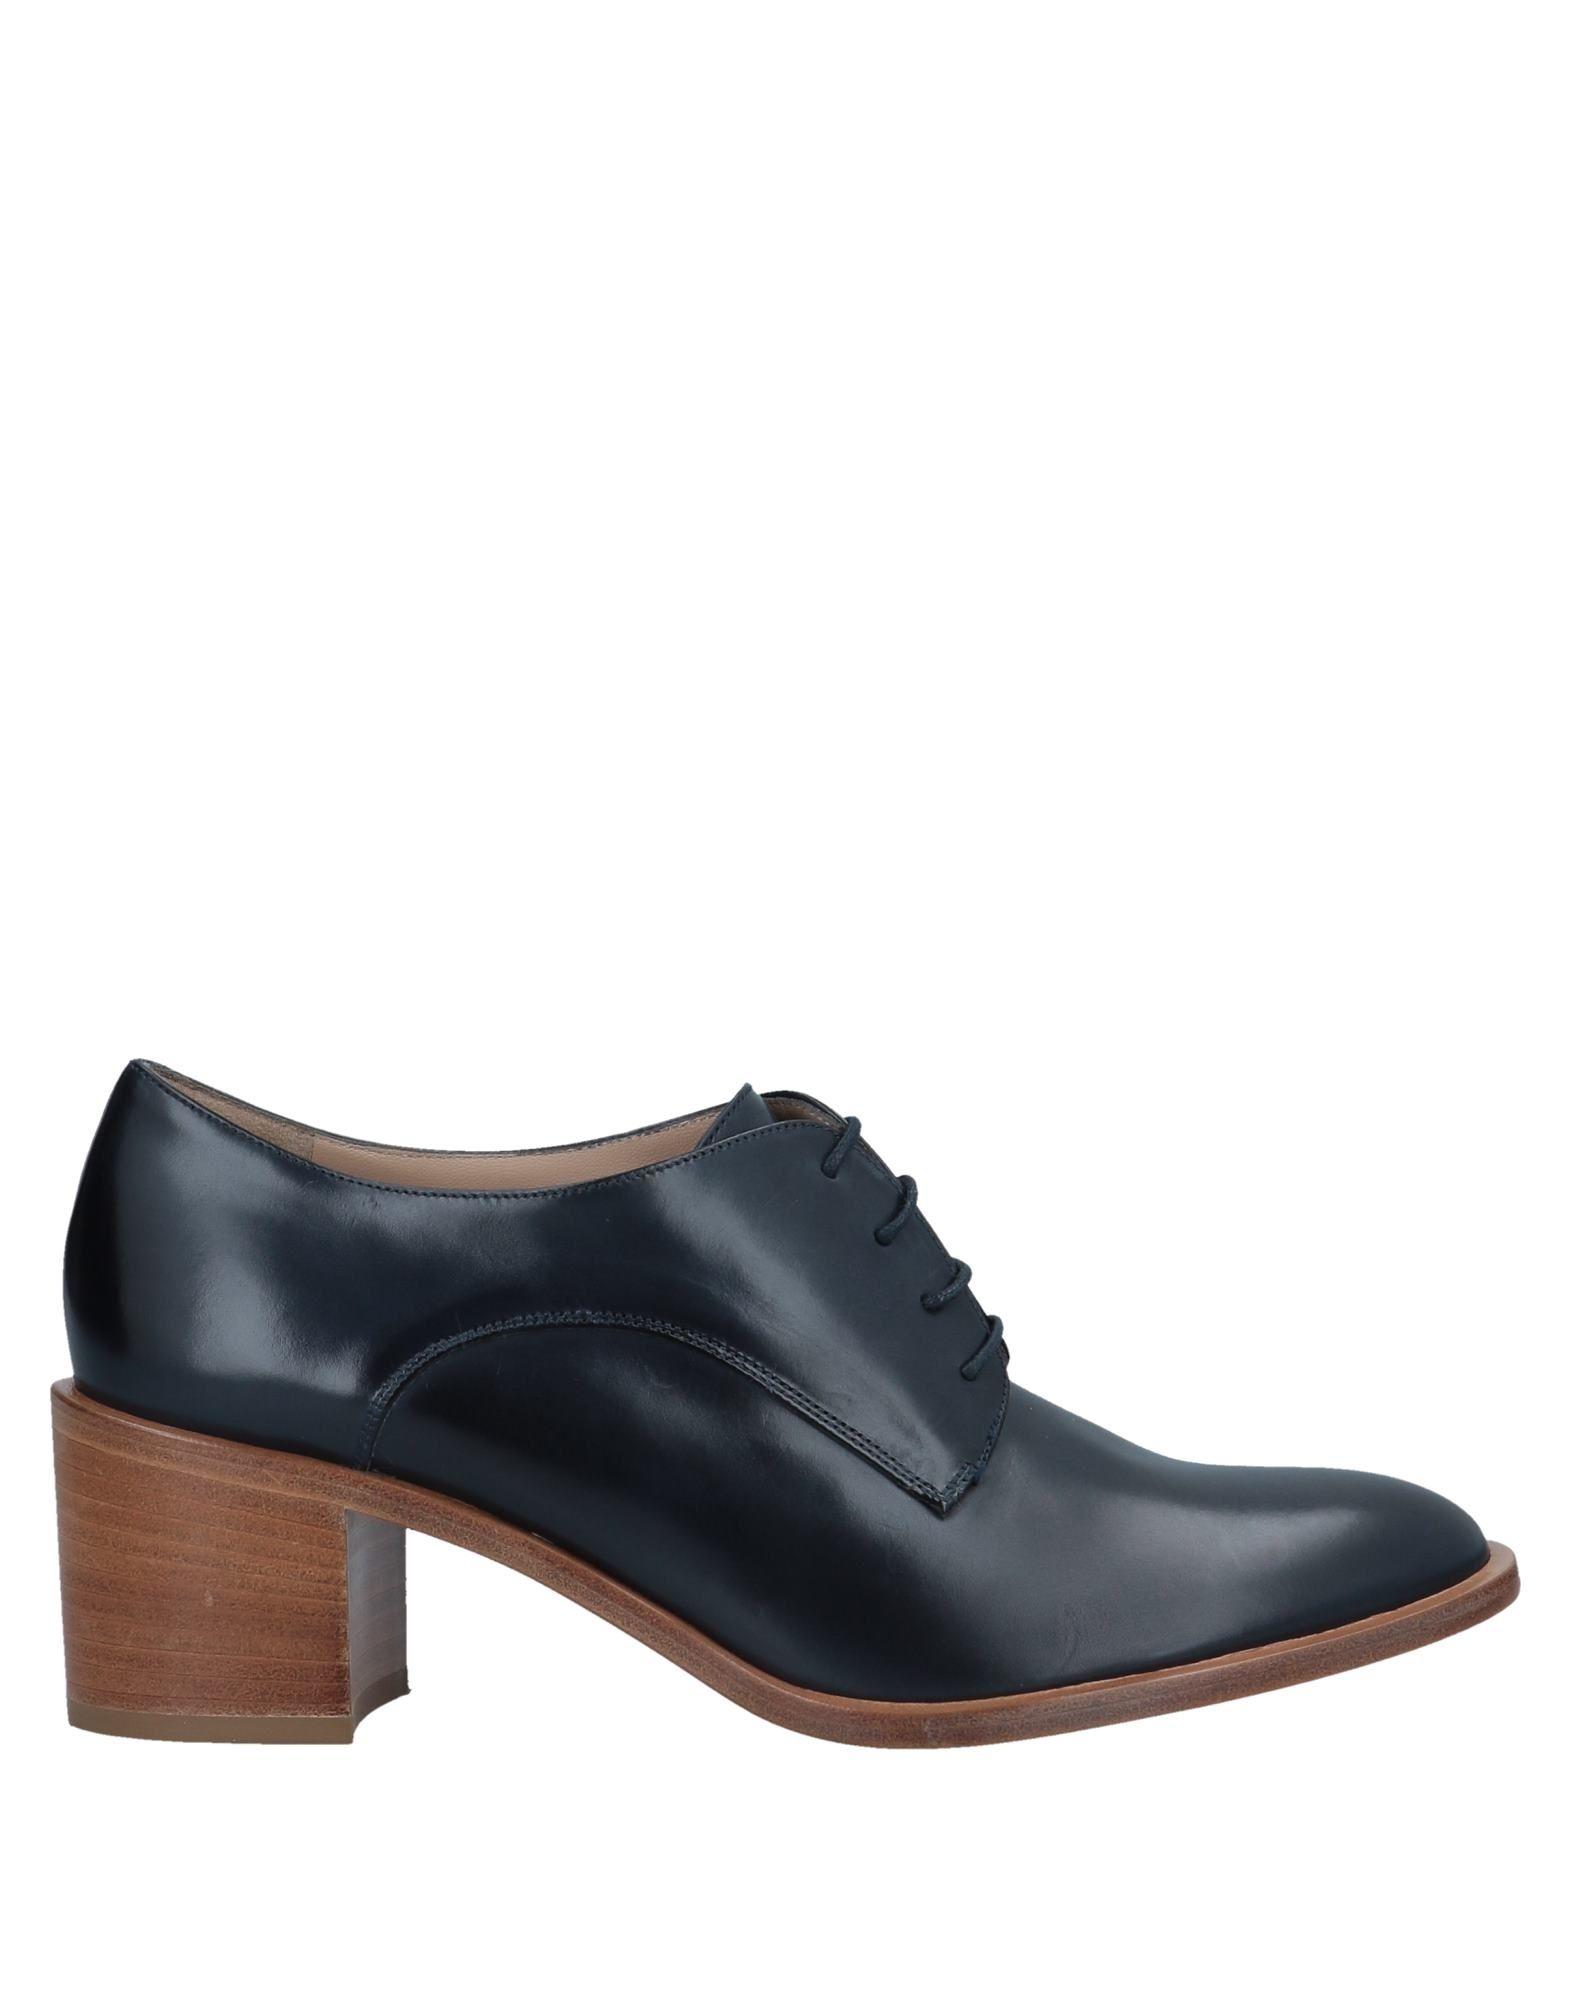 FRATELLI ROSSETTI | FRATELLI ROSSETTI Lace-Up Shoes 11550426 | Goxip